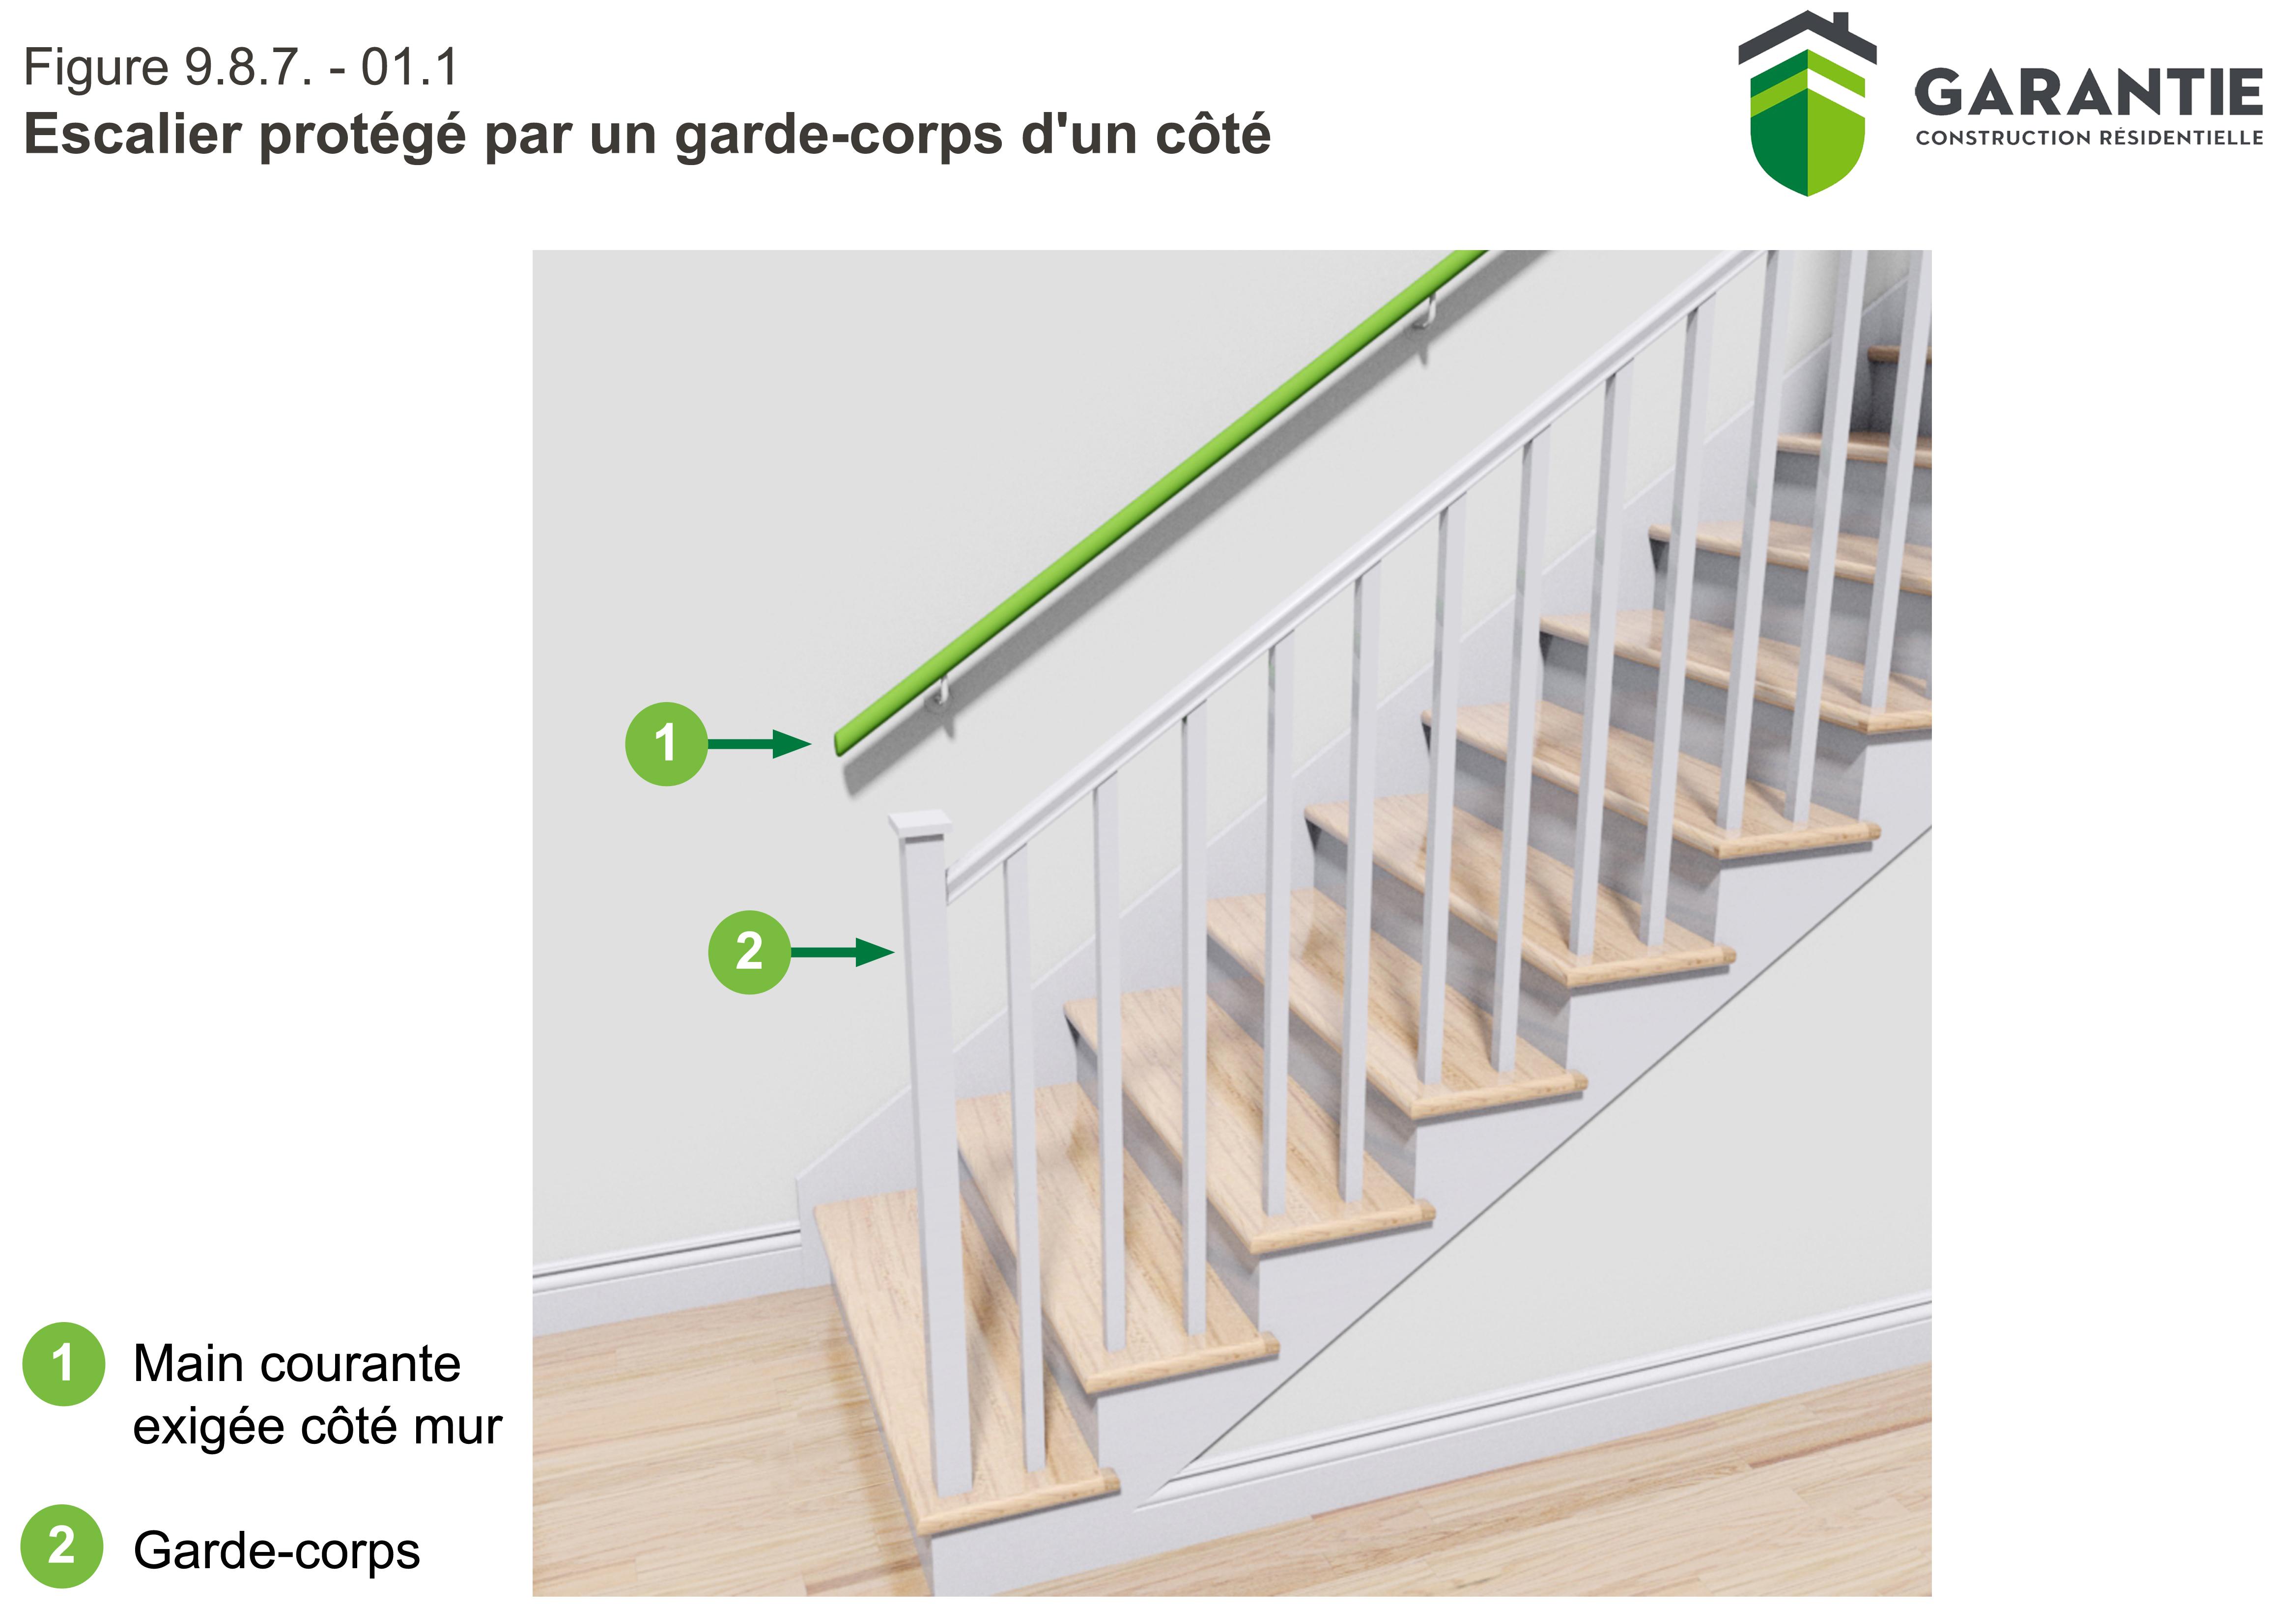 changer garde corps escalier escalier et garde corps en fer plein aix en provence with changer. Black Bedroom Furniture Sets. Home Design Ideas